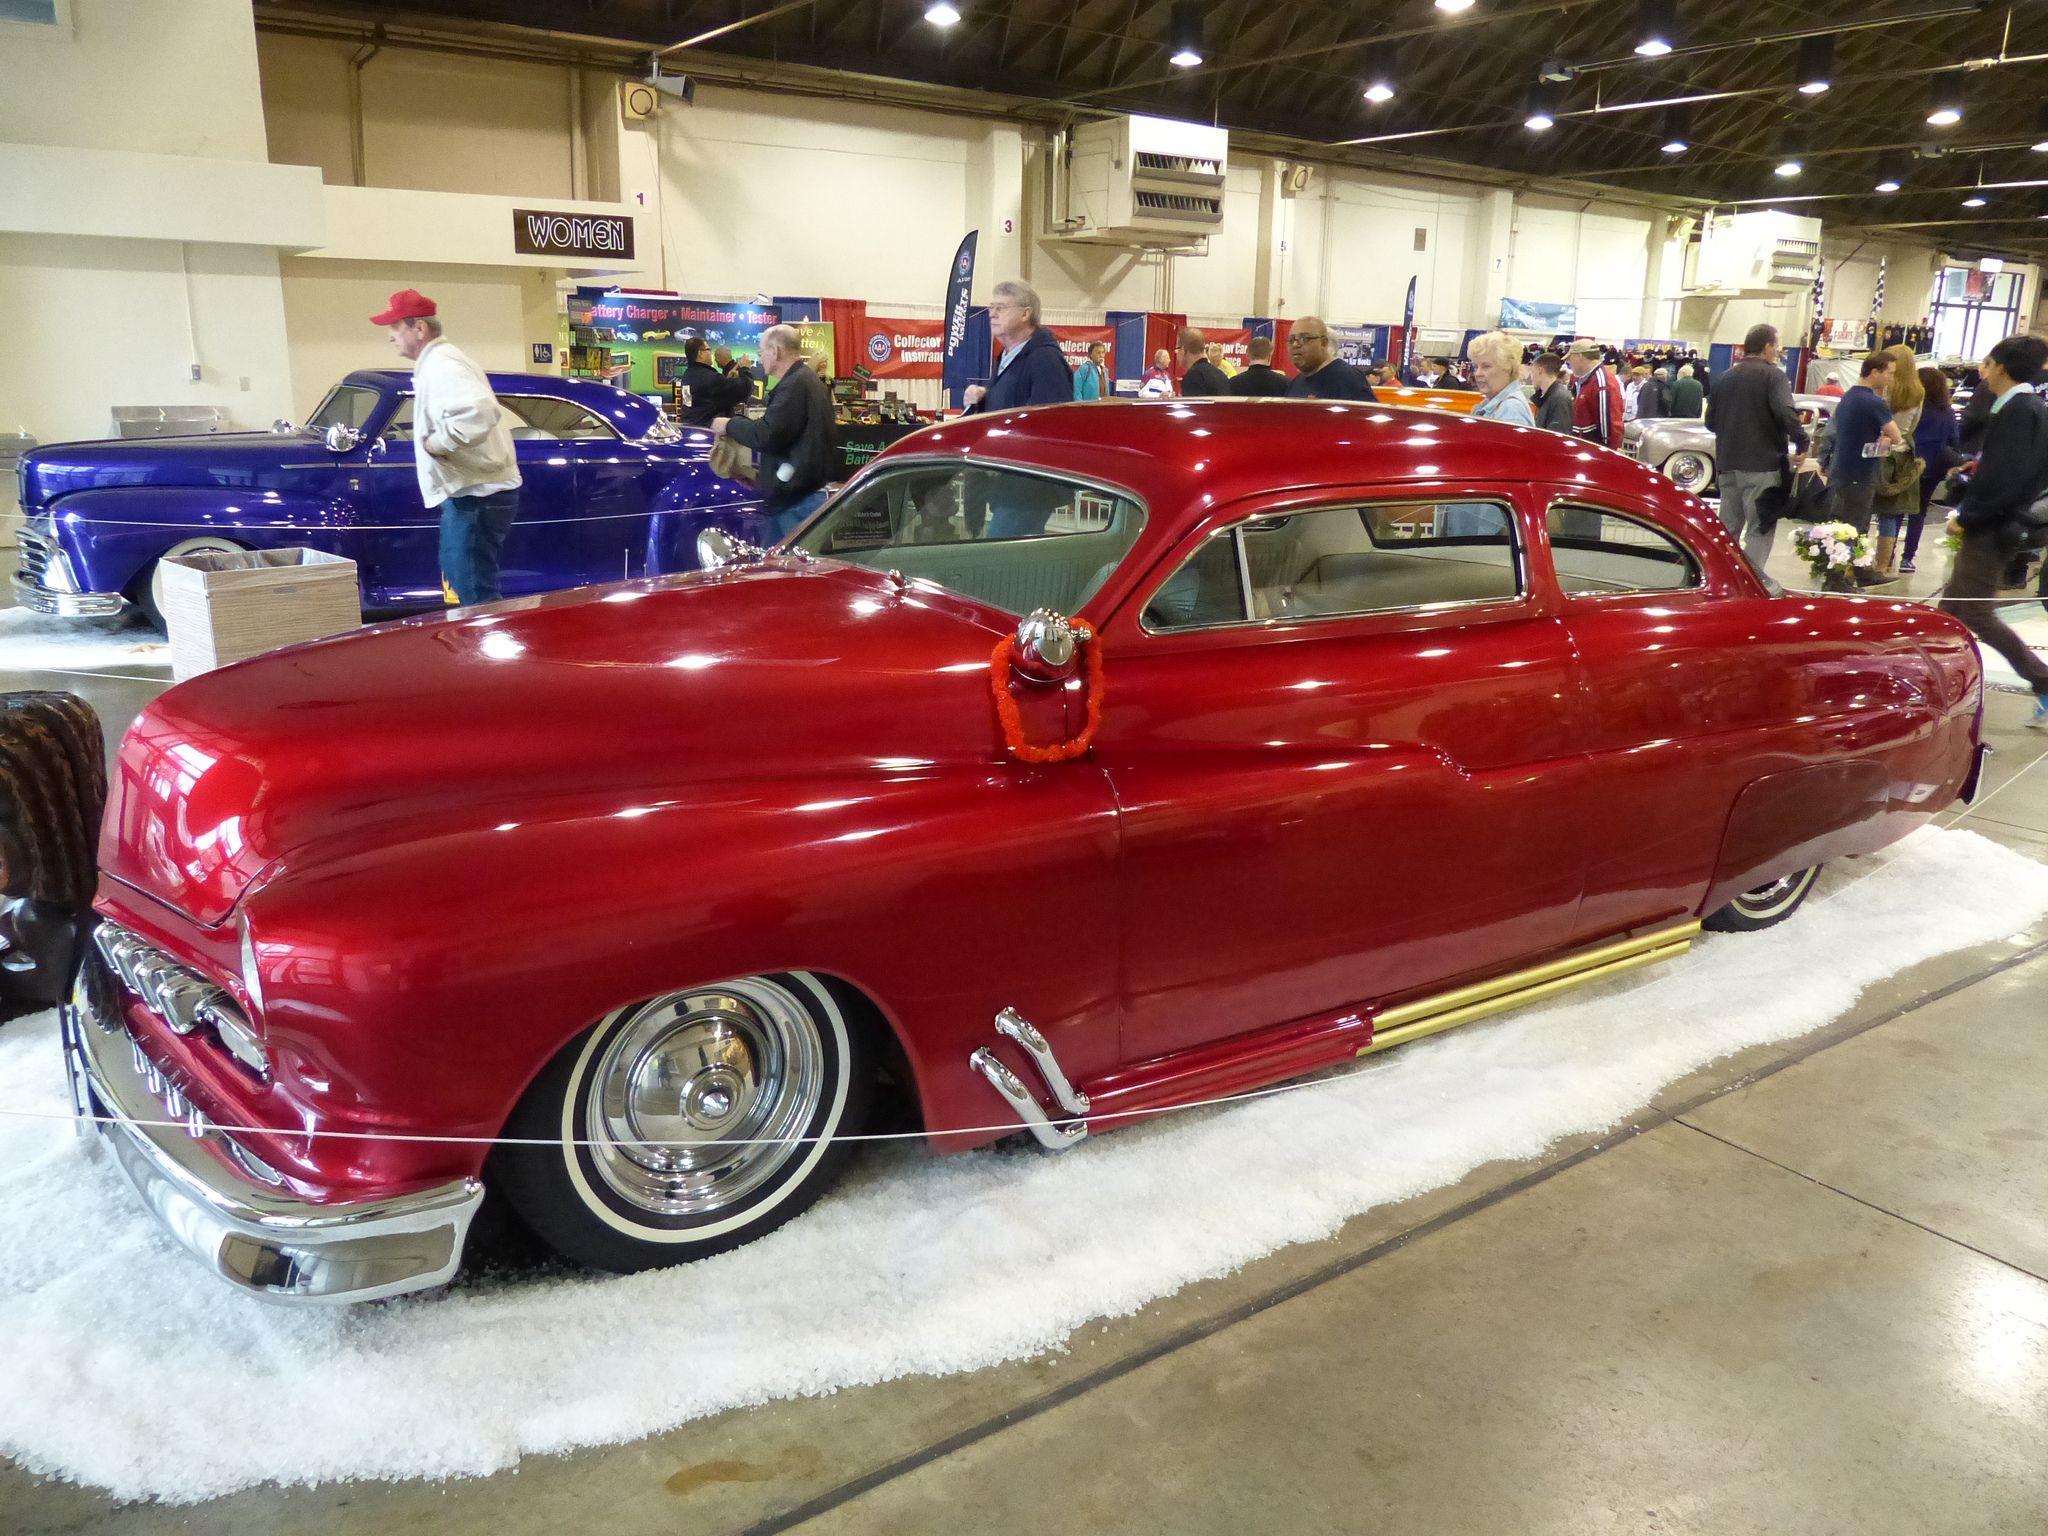 Bill Hines Kustom 1951 Mercury Kustom Custom Cars Hot Rods Cars